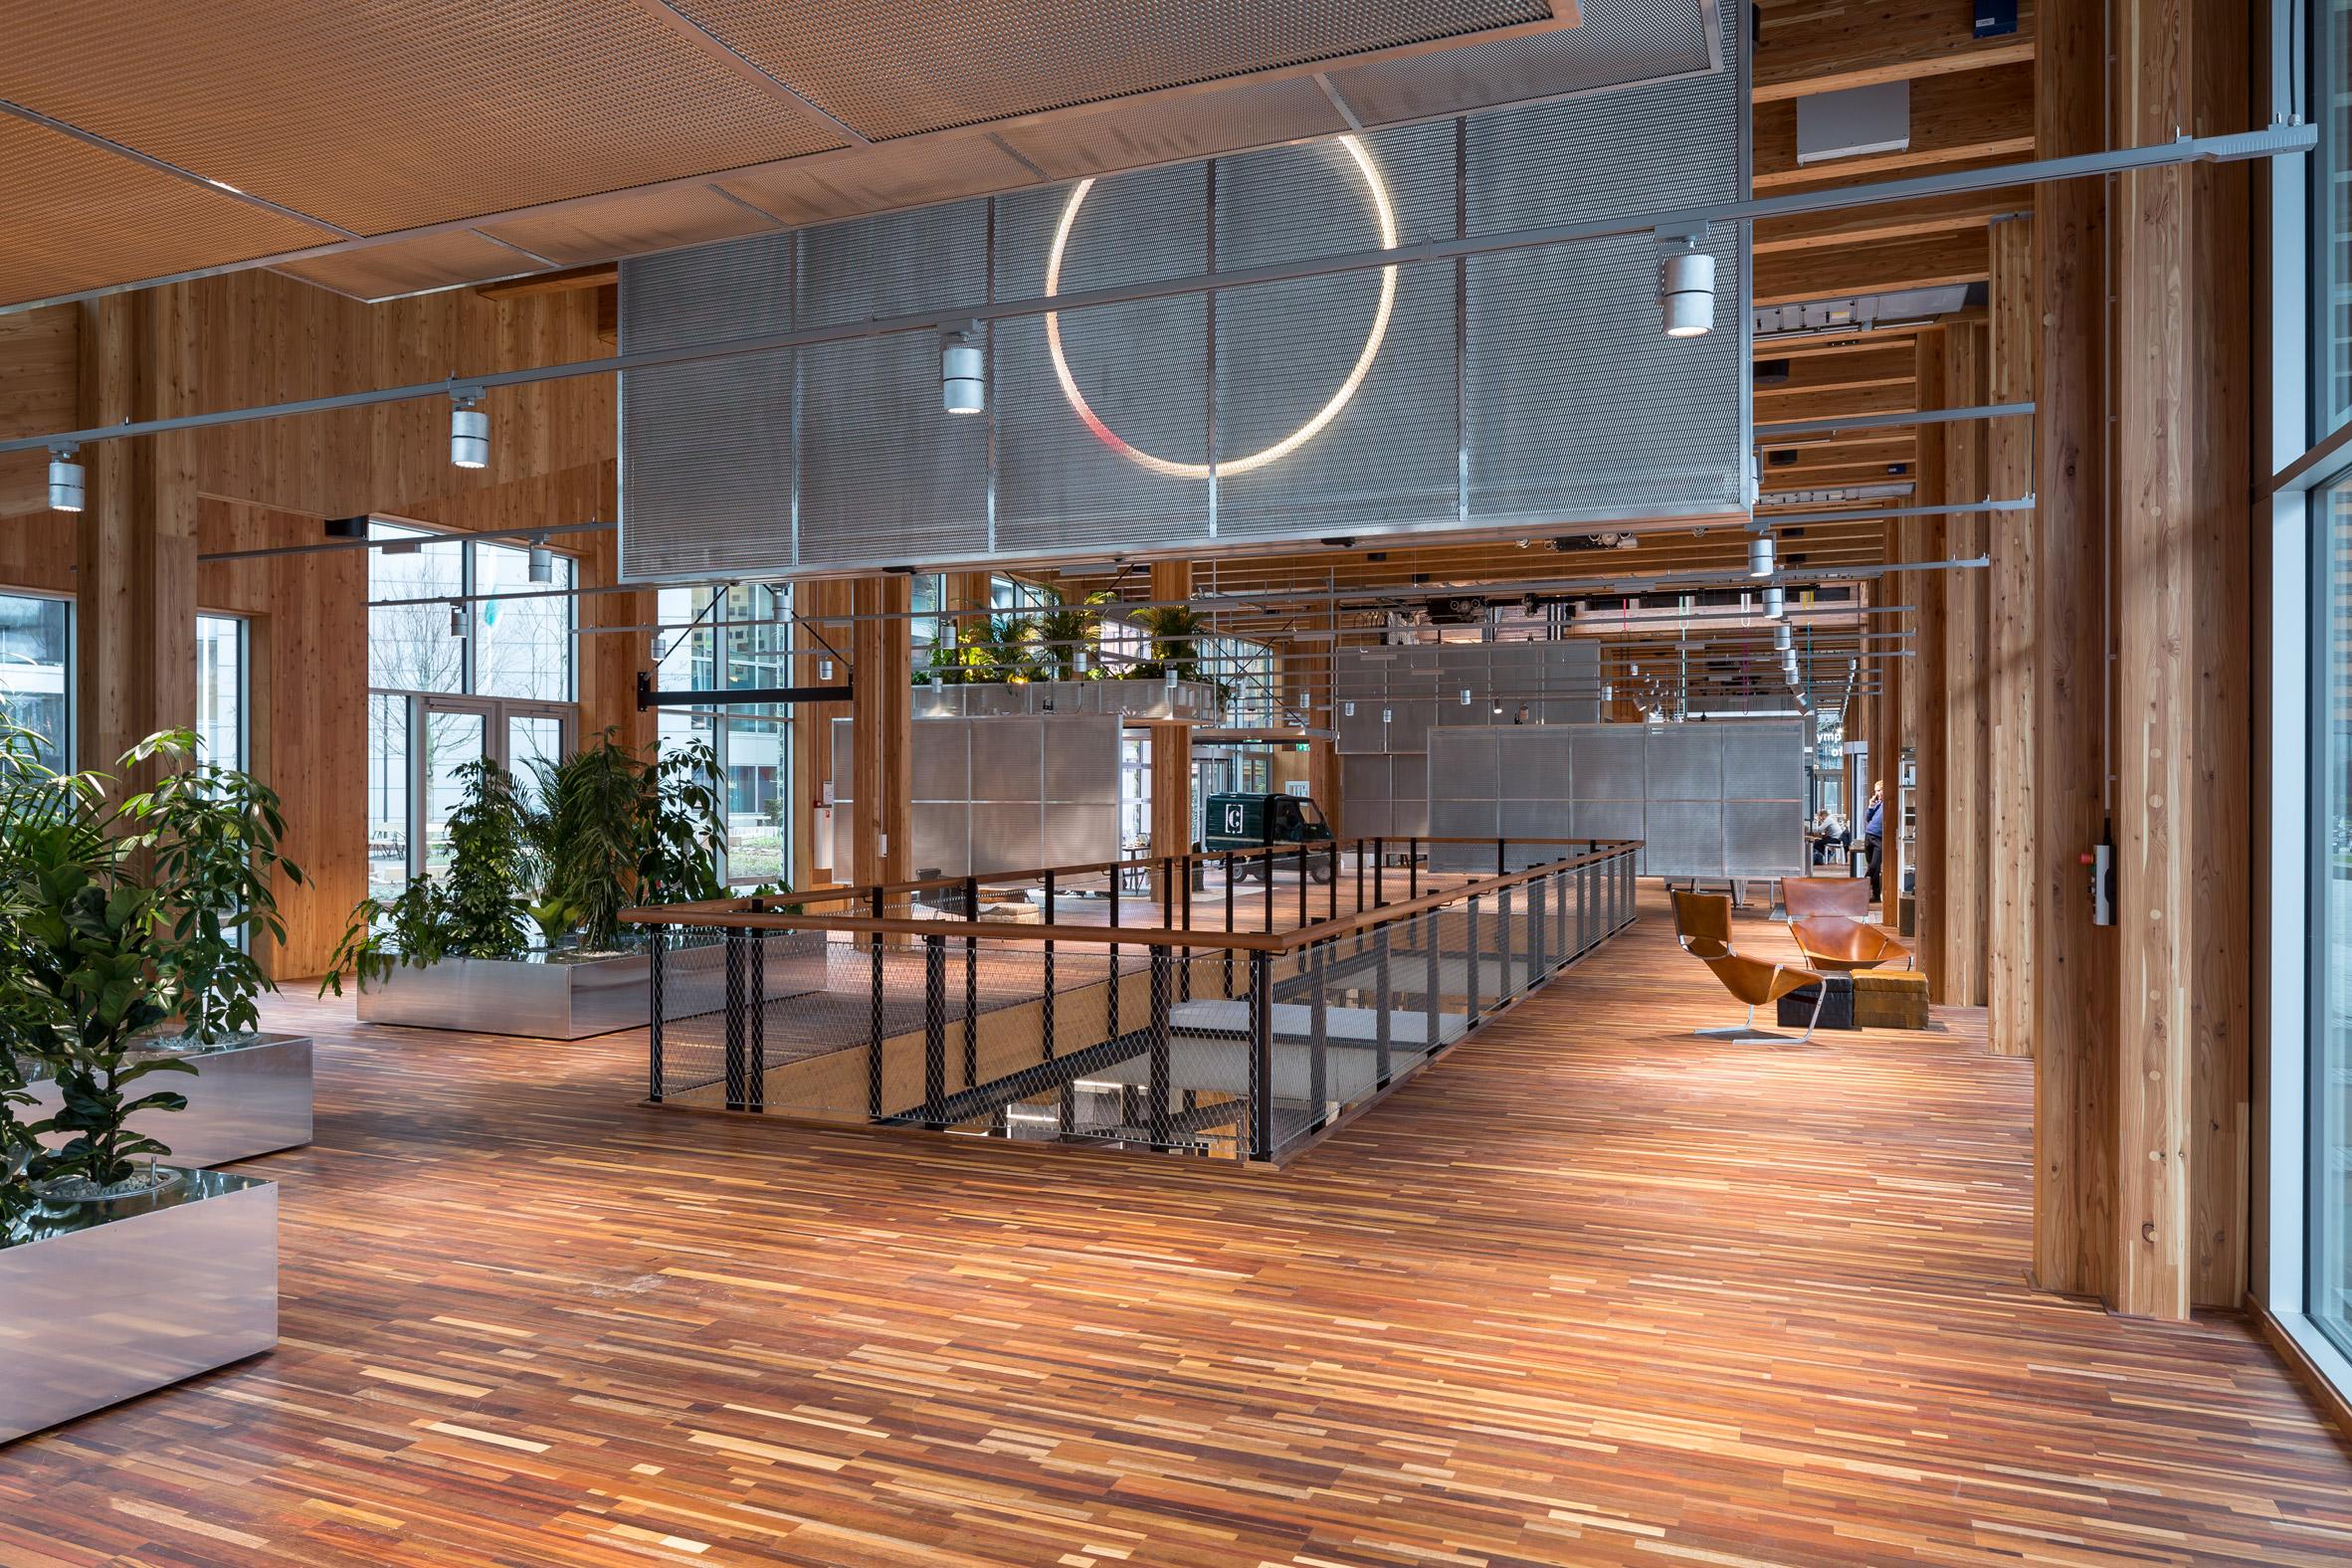 DoepelStrijkers applies circular economy principles to Circl pavilion